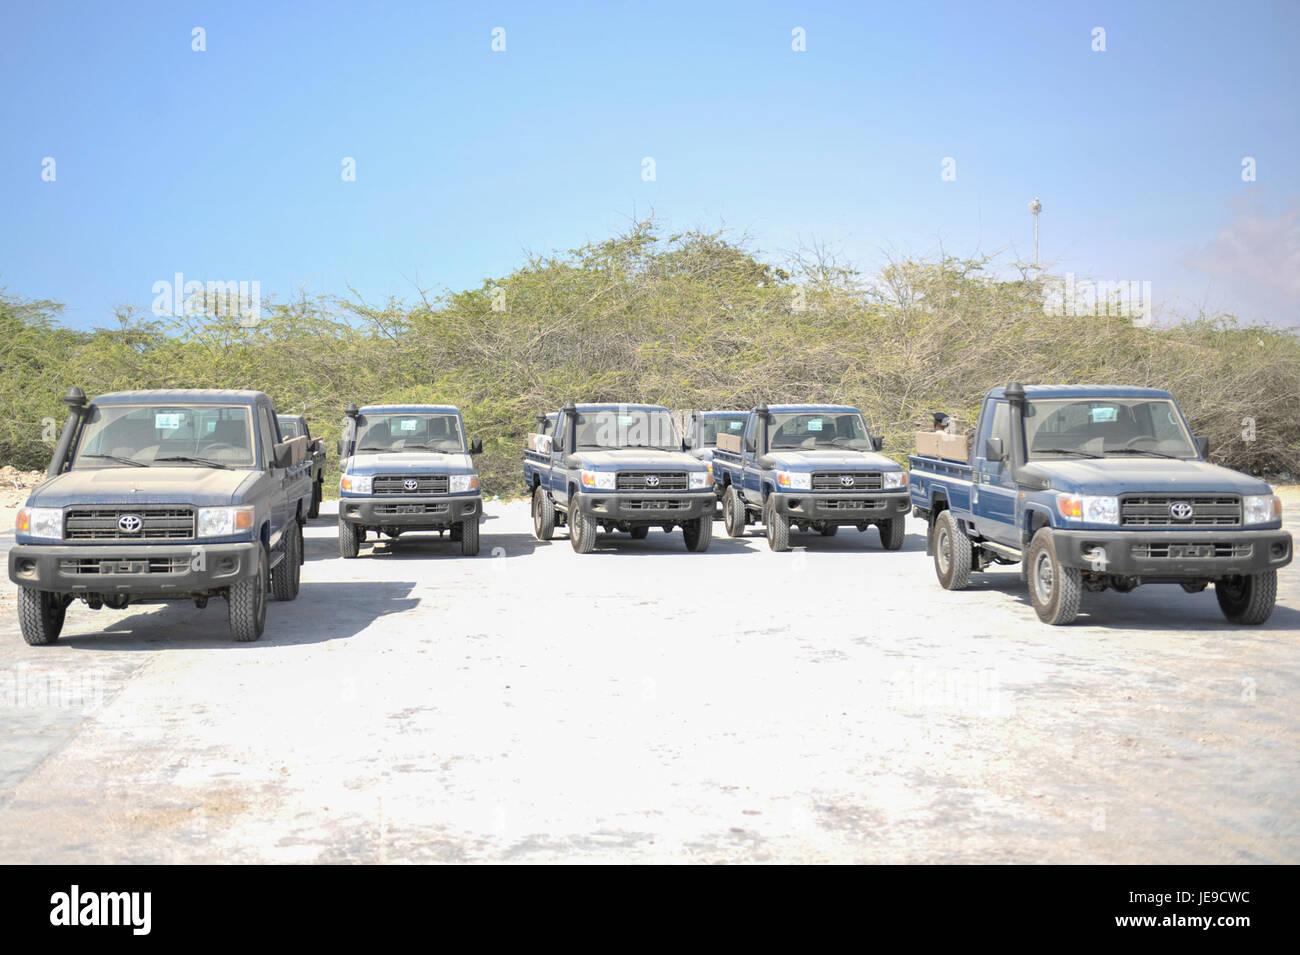 2014 03 01 Vehicles Handover-1 (12853859413) - Stock Image